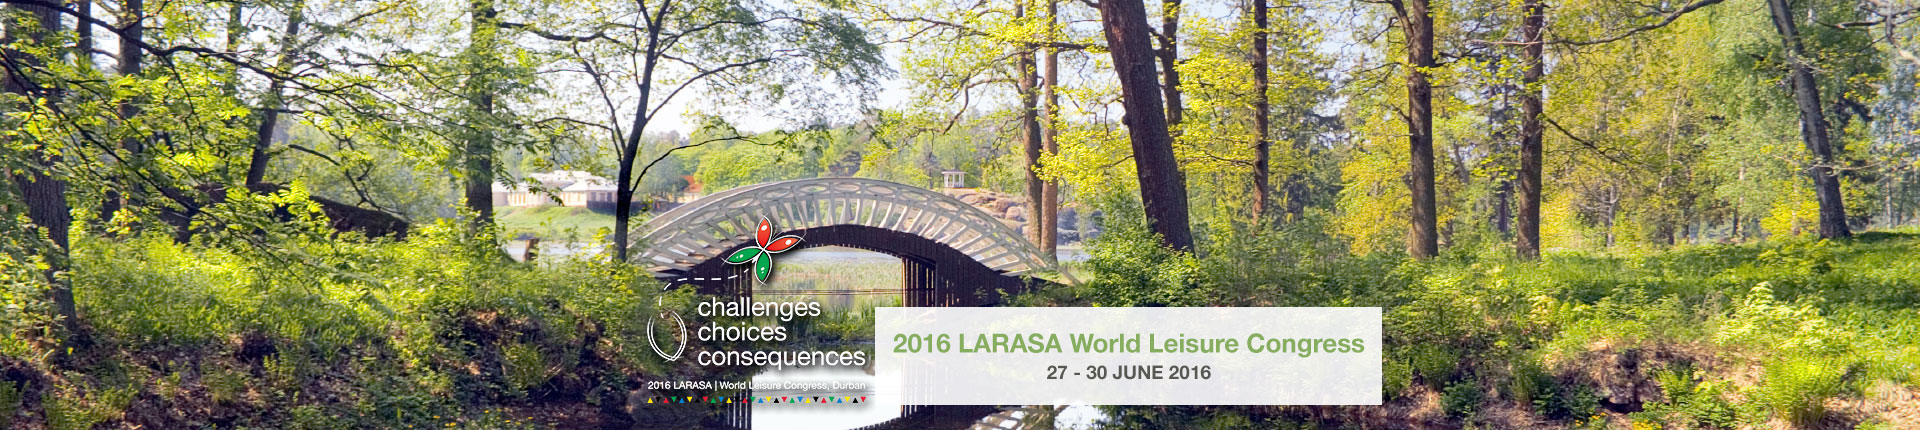 larasa-banners-5